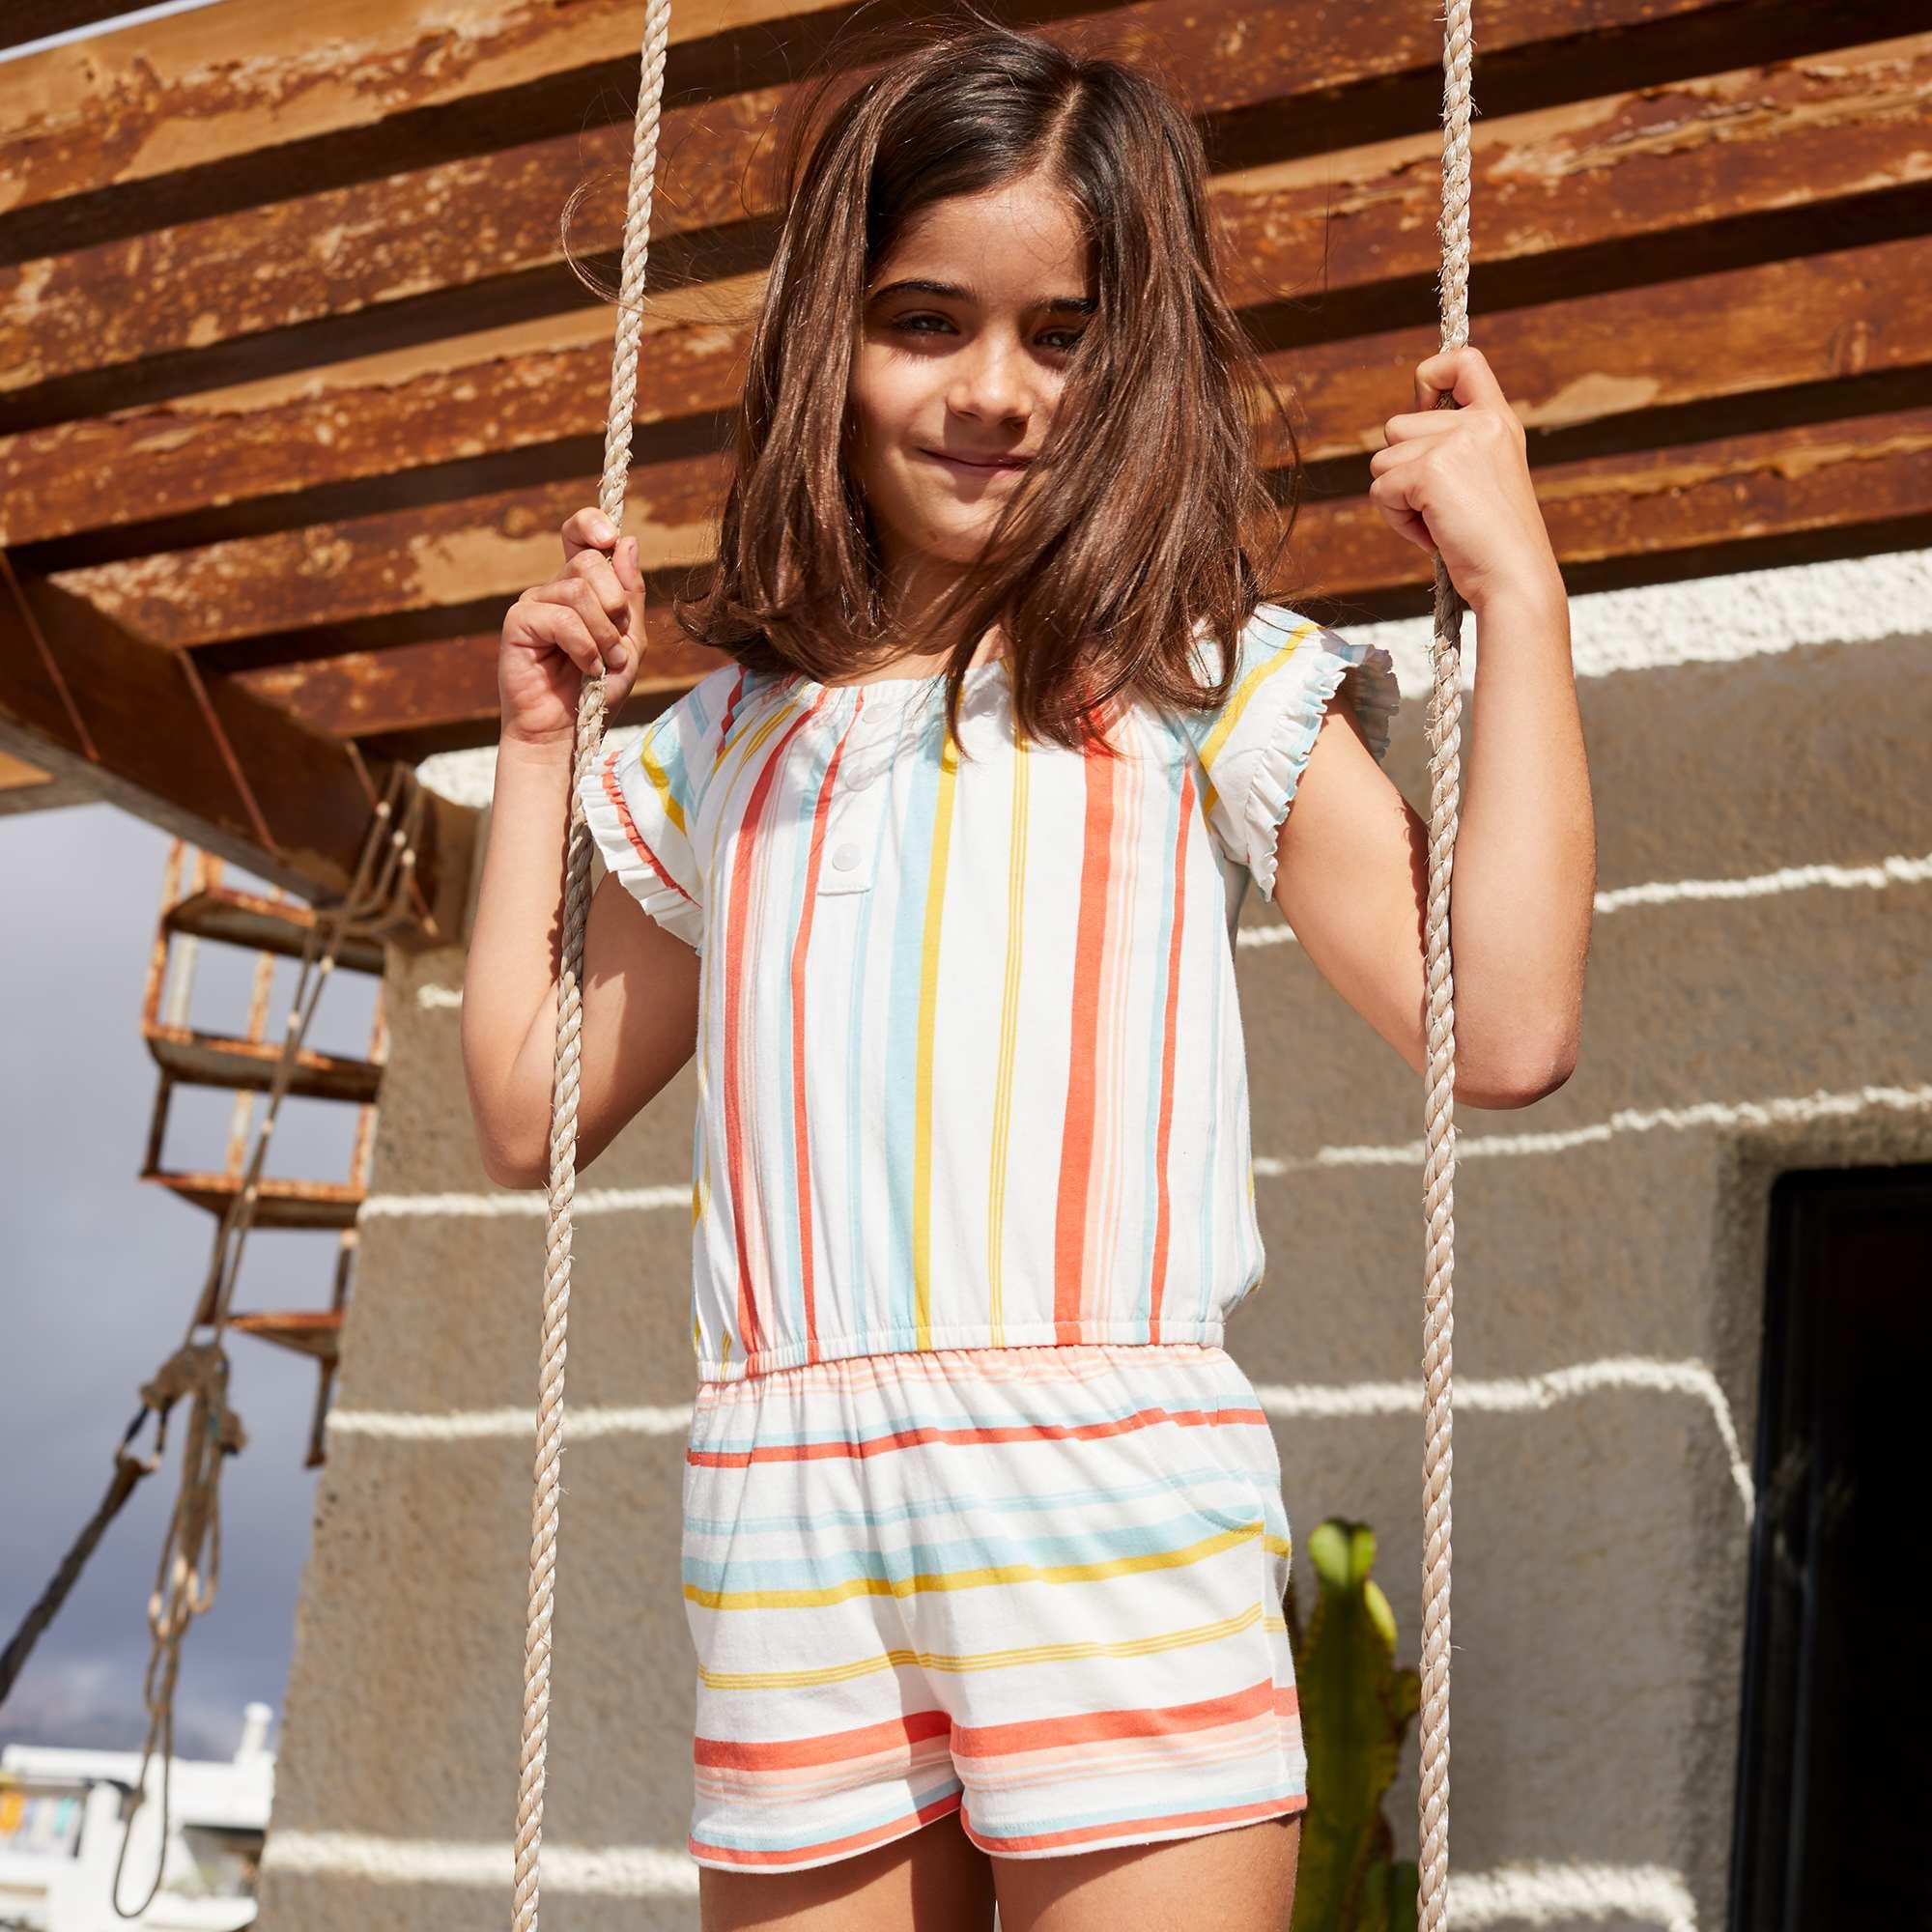 Kinderkleding En Meer.Playsuit Met Een Print Kinderkleding Meisjes Meerkleurig Gestreept